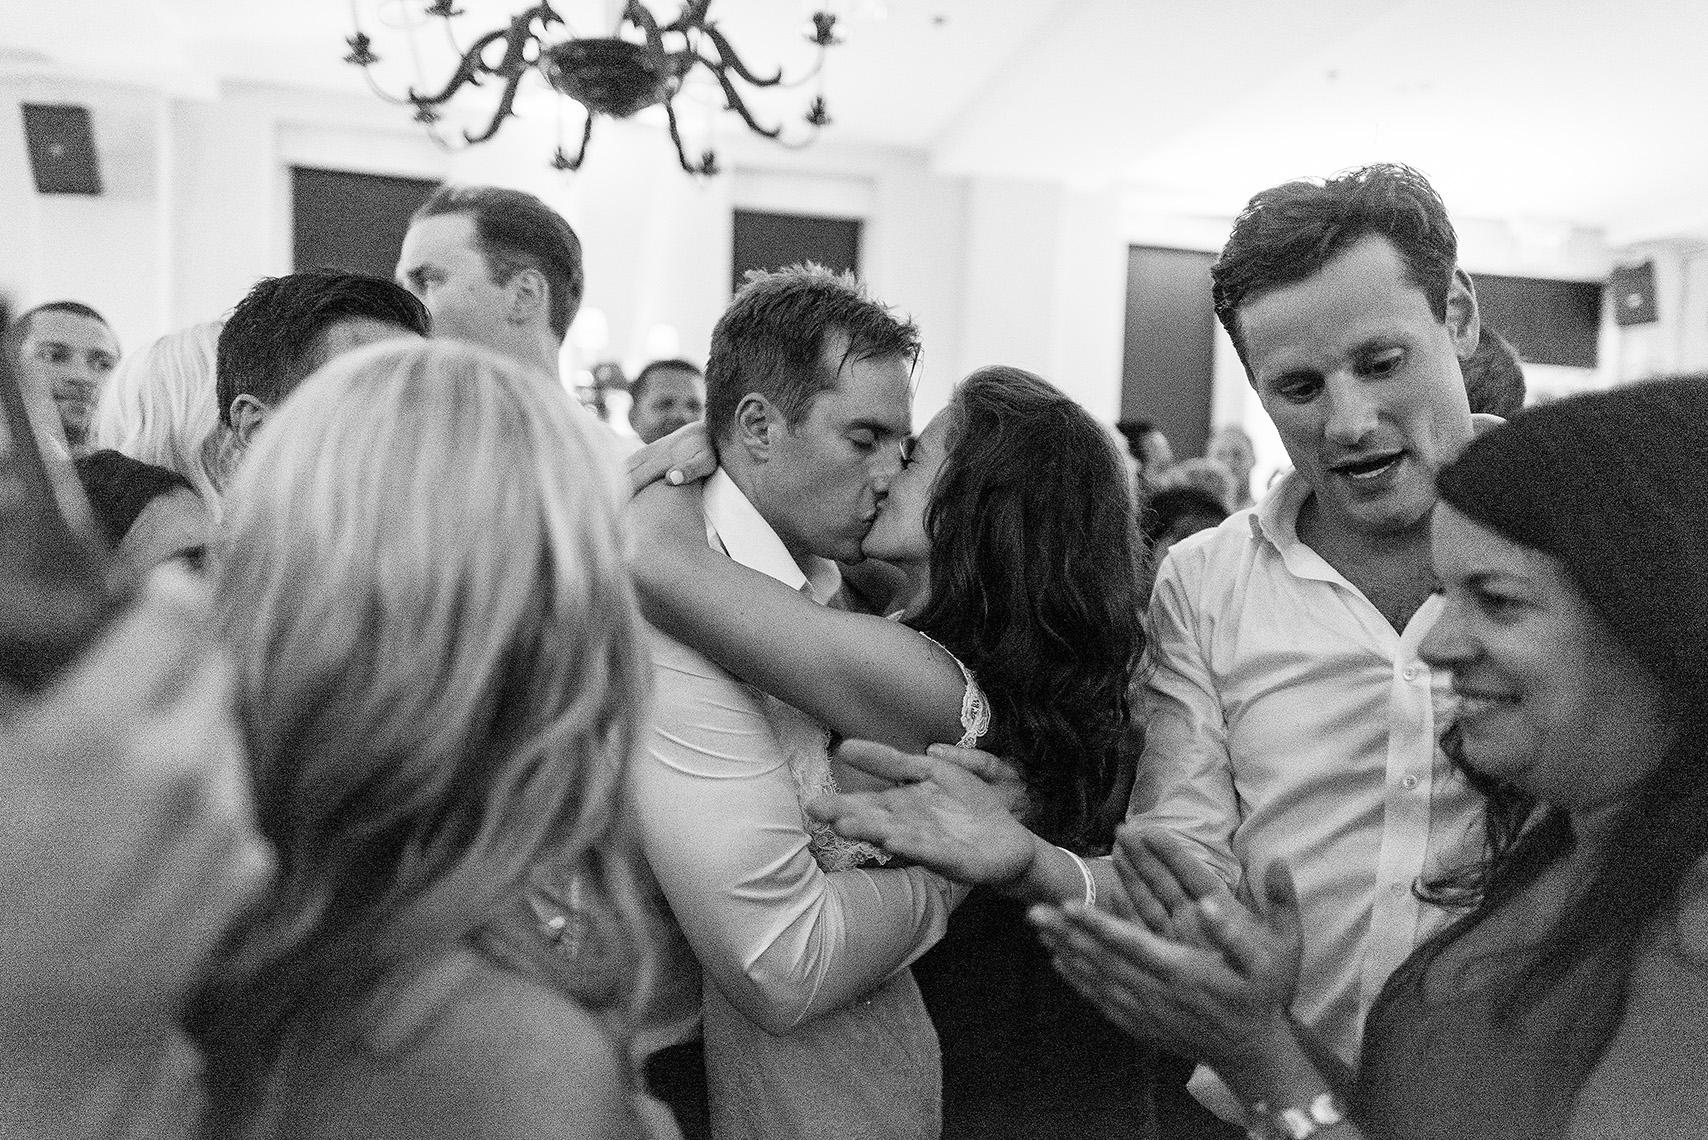 john-schnack-cape-may-destination-wedding-photographer-23.jpg